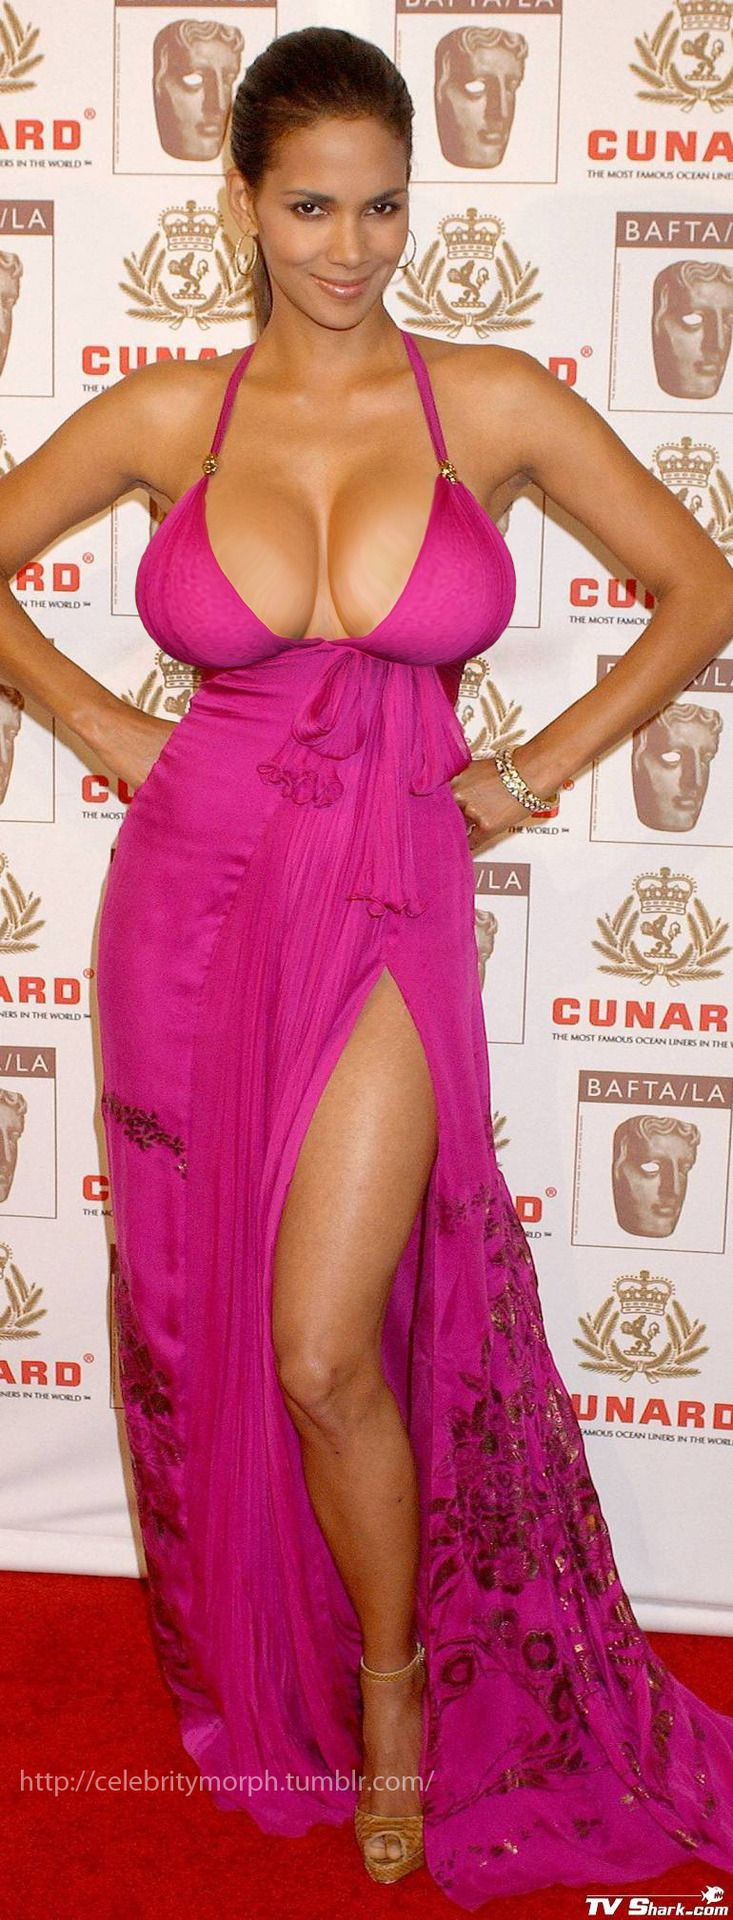 Celebrity boob blog